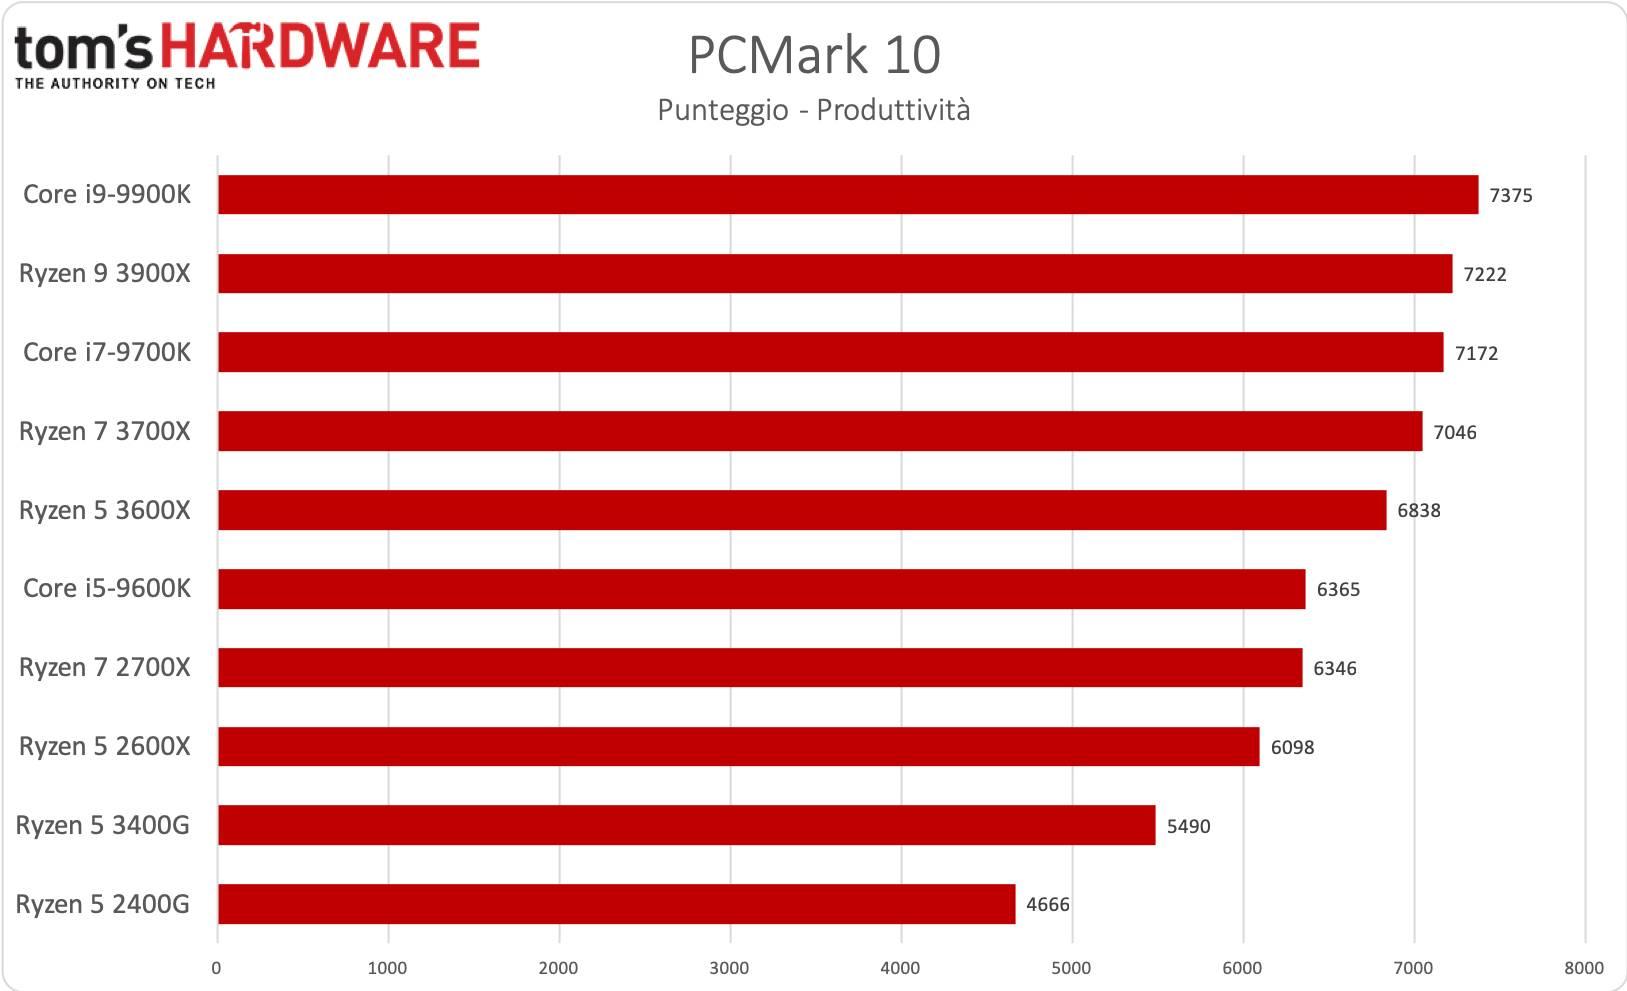 AMD Ryzen 5 3400G - PCMark 10